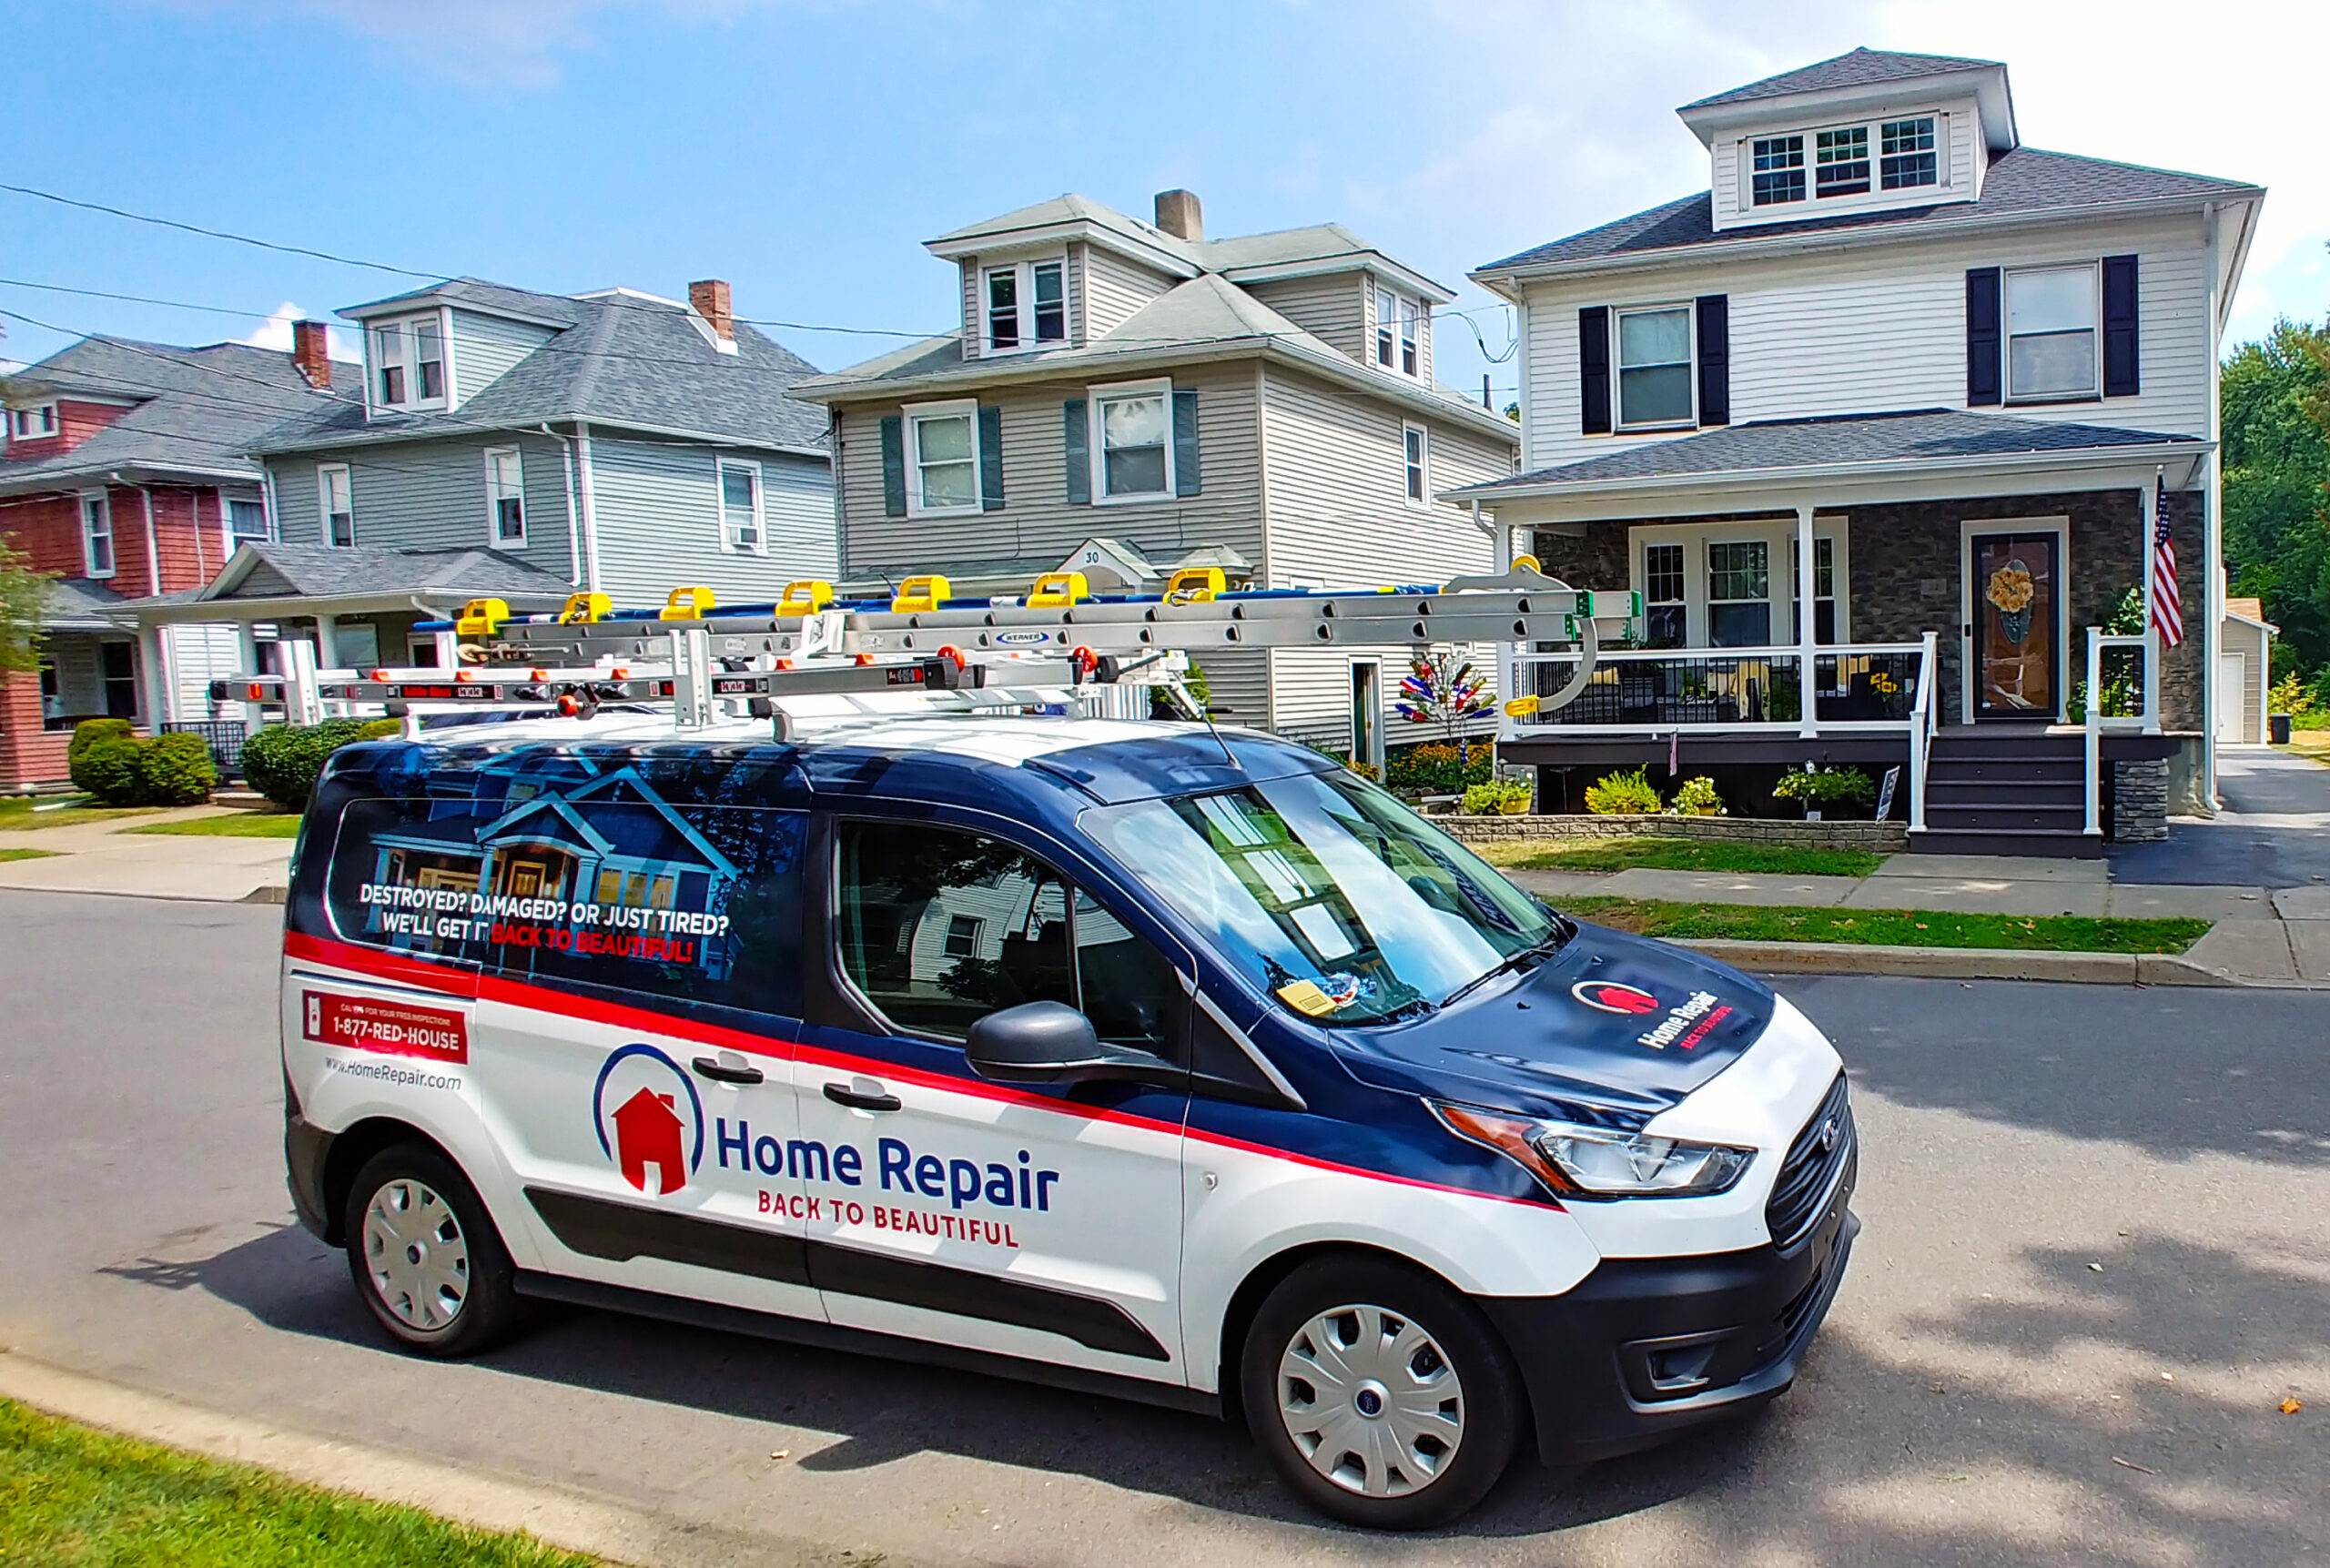 Top 10 Property Maintenance Tips